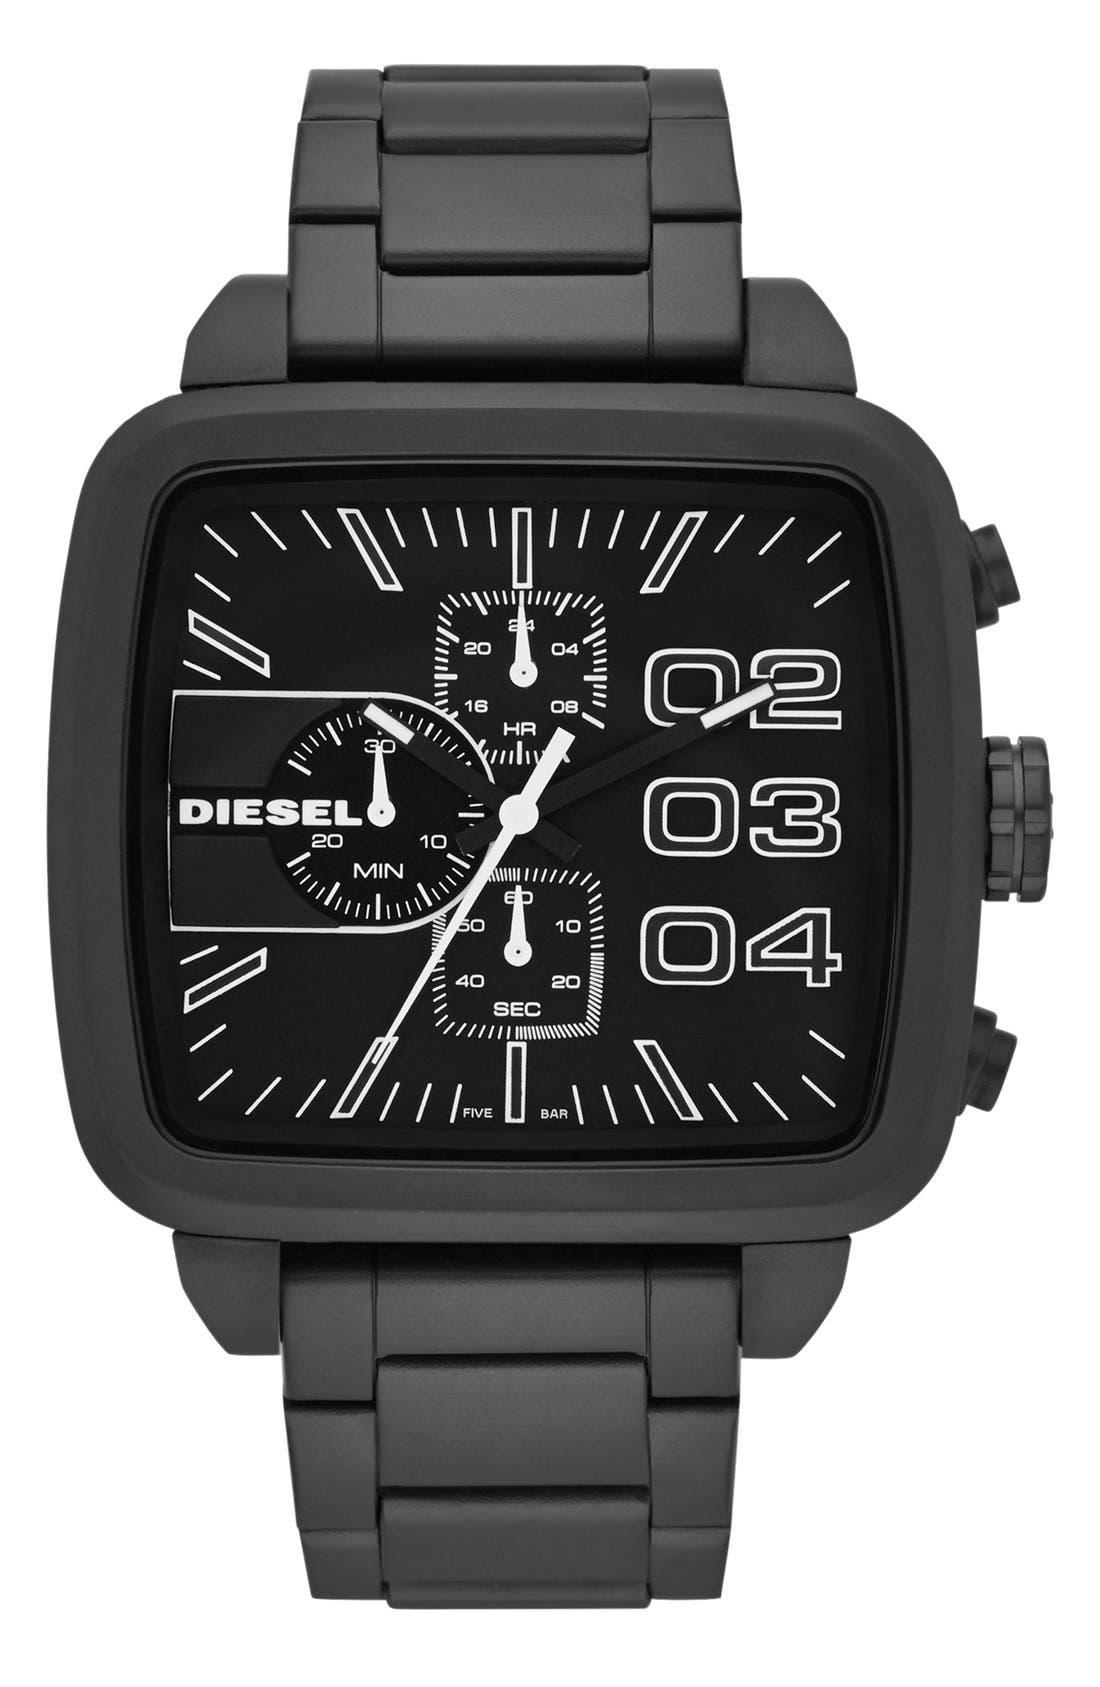 Alternate Image 1 Selected - DIESEL® 'Square Franchise' Bracelet Watch, 57mm x 48mm